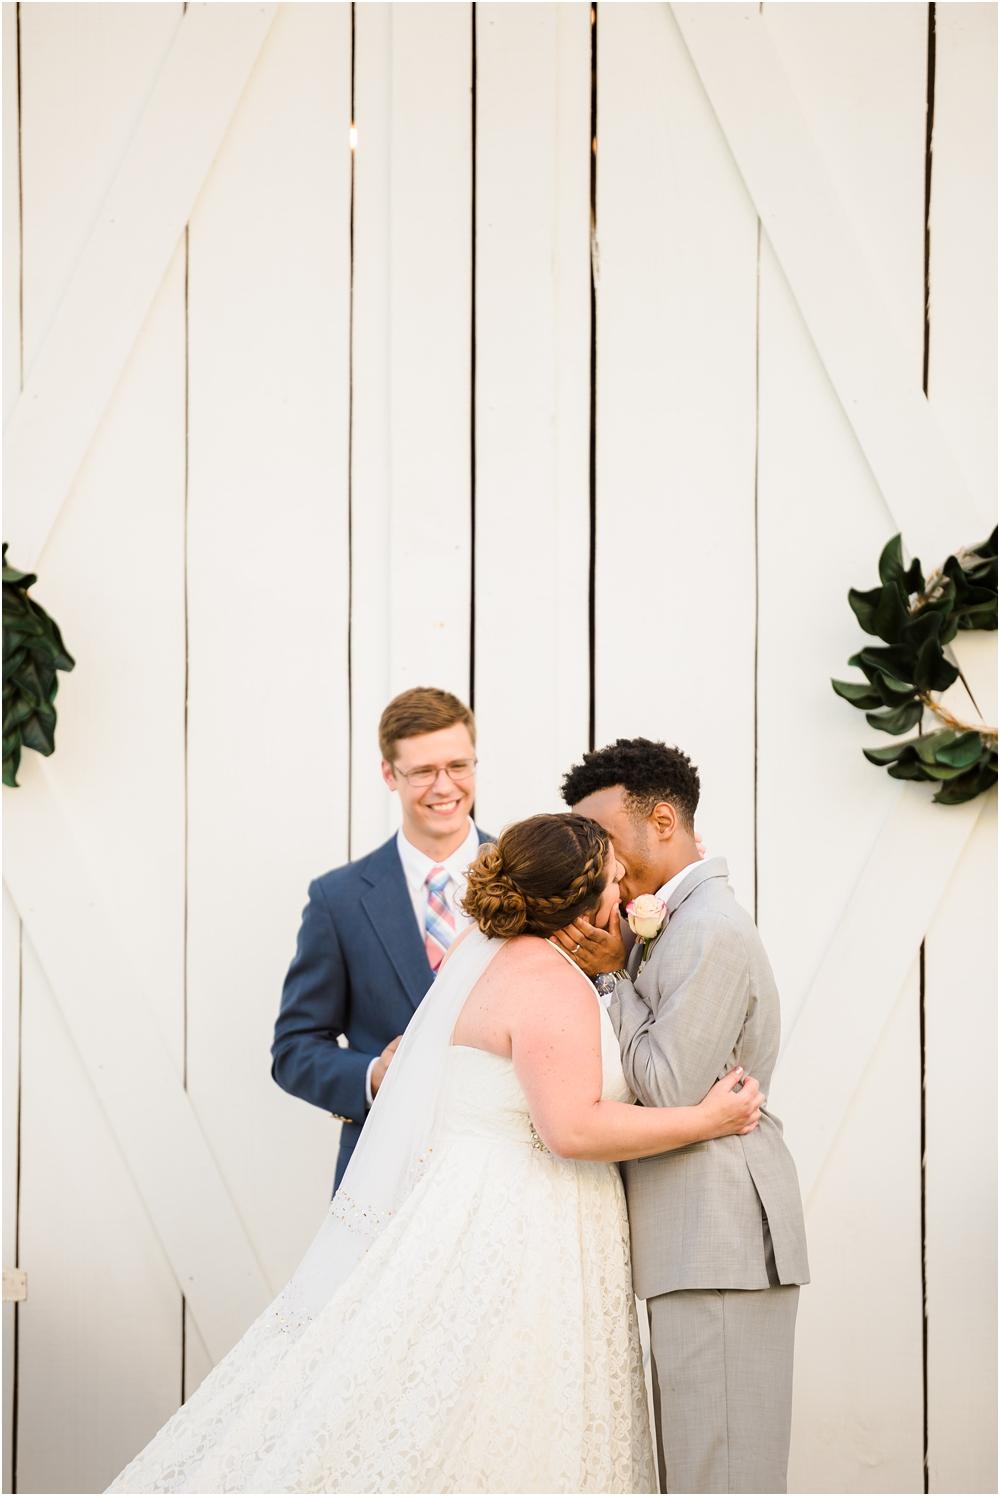 mosley-wedding-kiersten-stevenson-photography-30a-panama-city-beach-dothan-tallahassee-(200-of-472).JPG